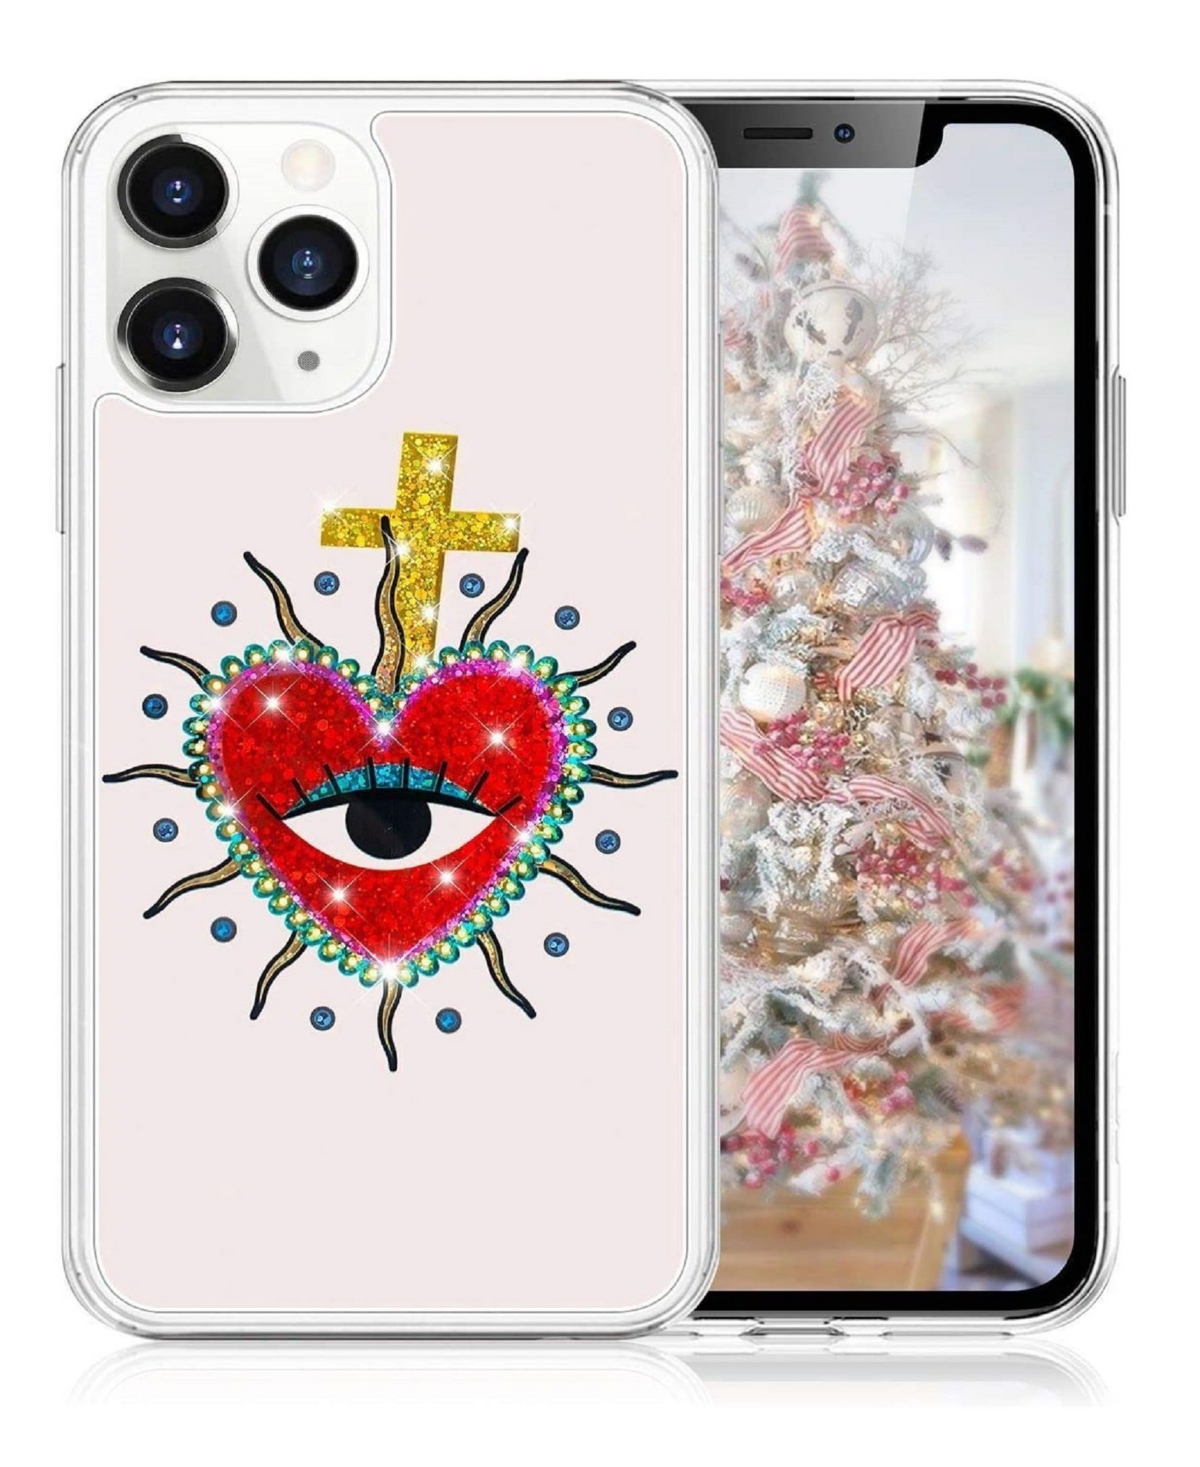 Milanblocks iPhone 11 Pro Max Heart Glitter Phone Case